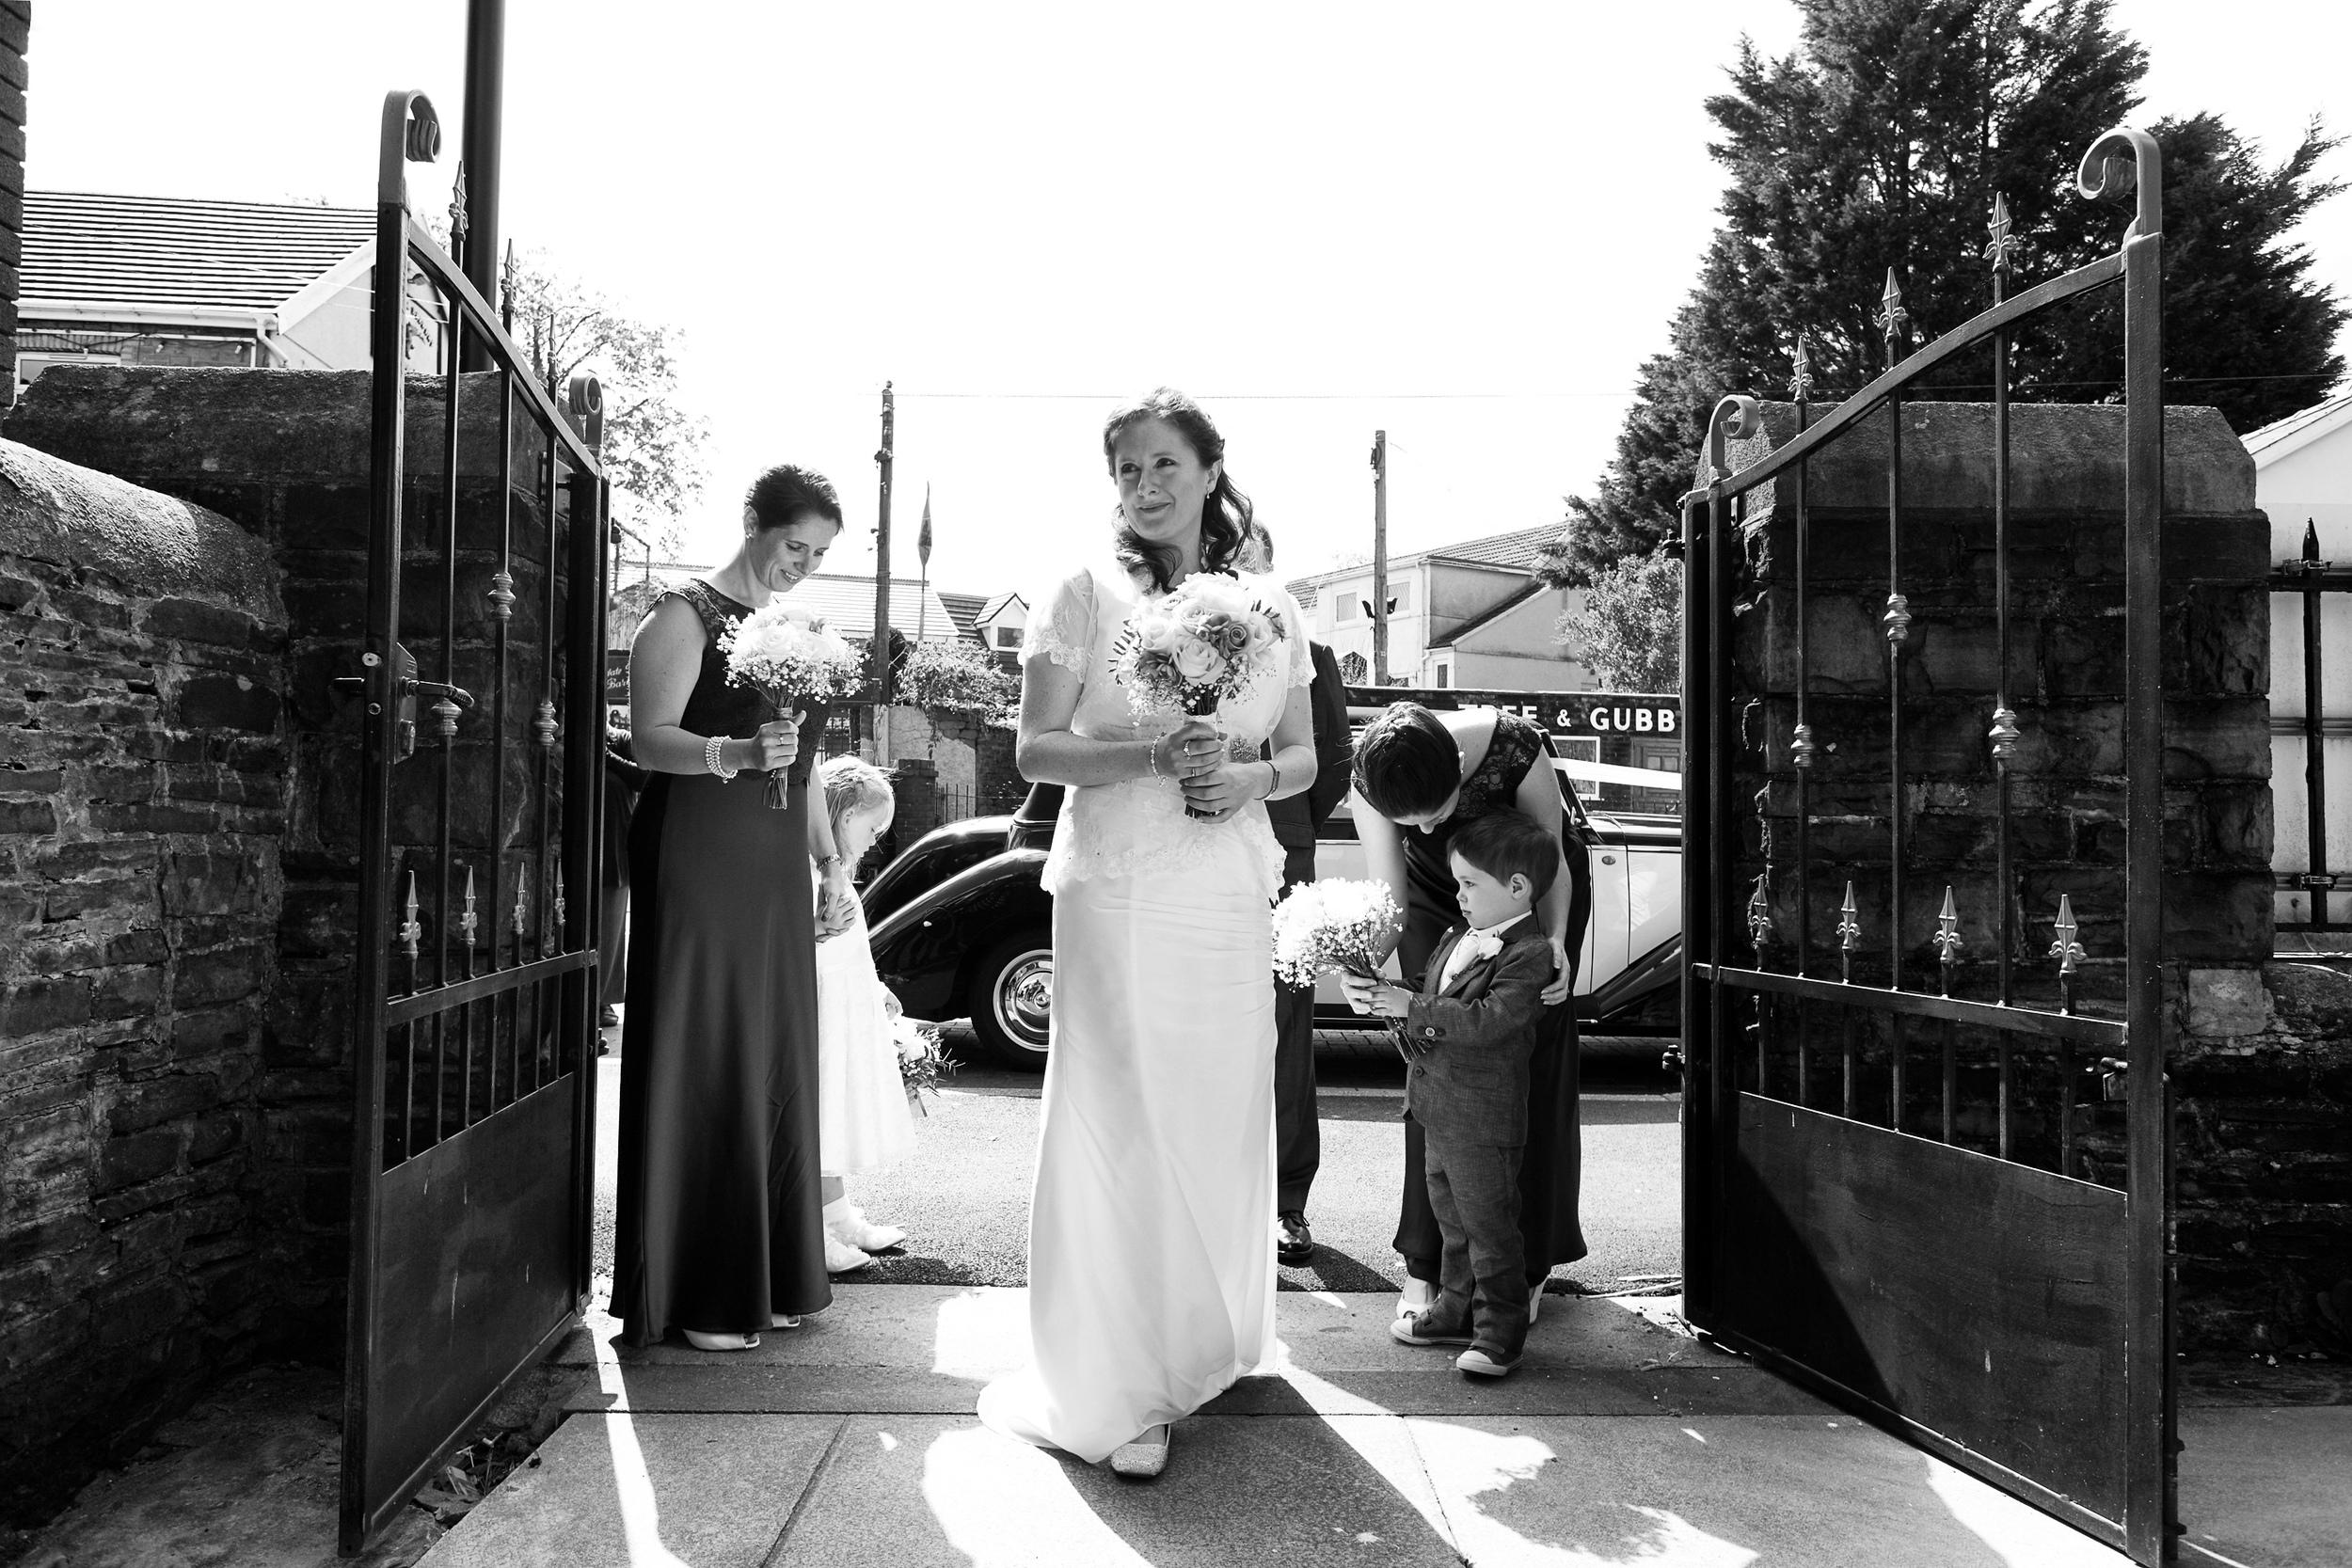 Ocean-View-Gower-Wedding-Photographer-013.JPG